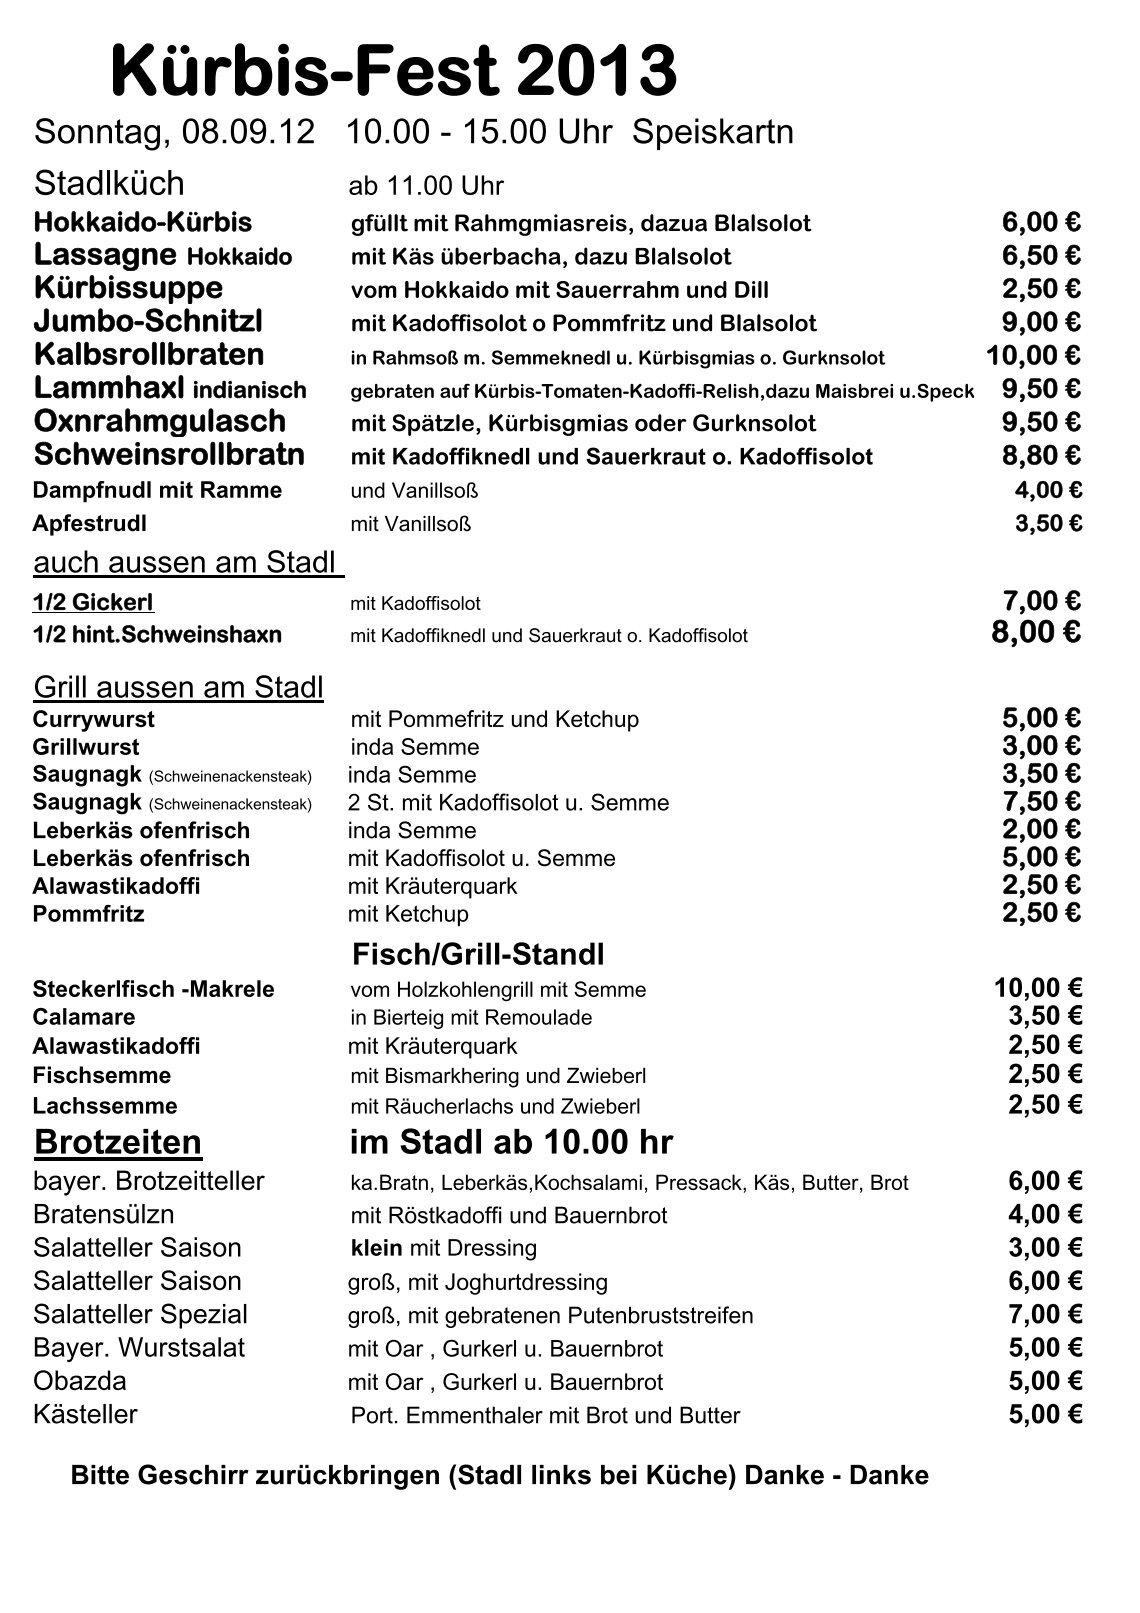 Großartig Getränke Beier Fotos - Die Schlafzimmerideen - kruloei.info